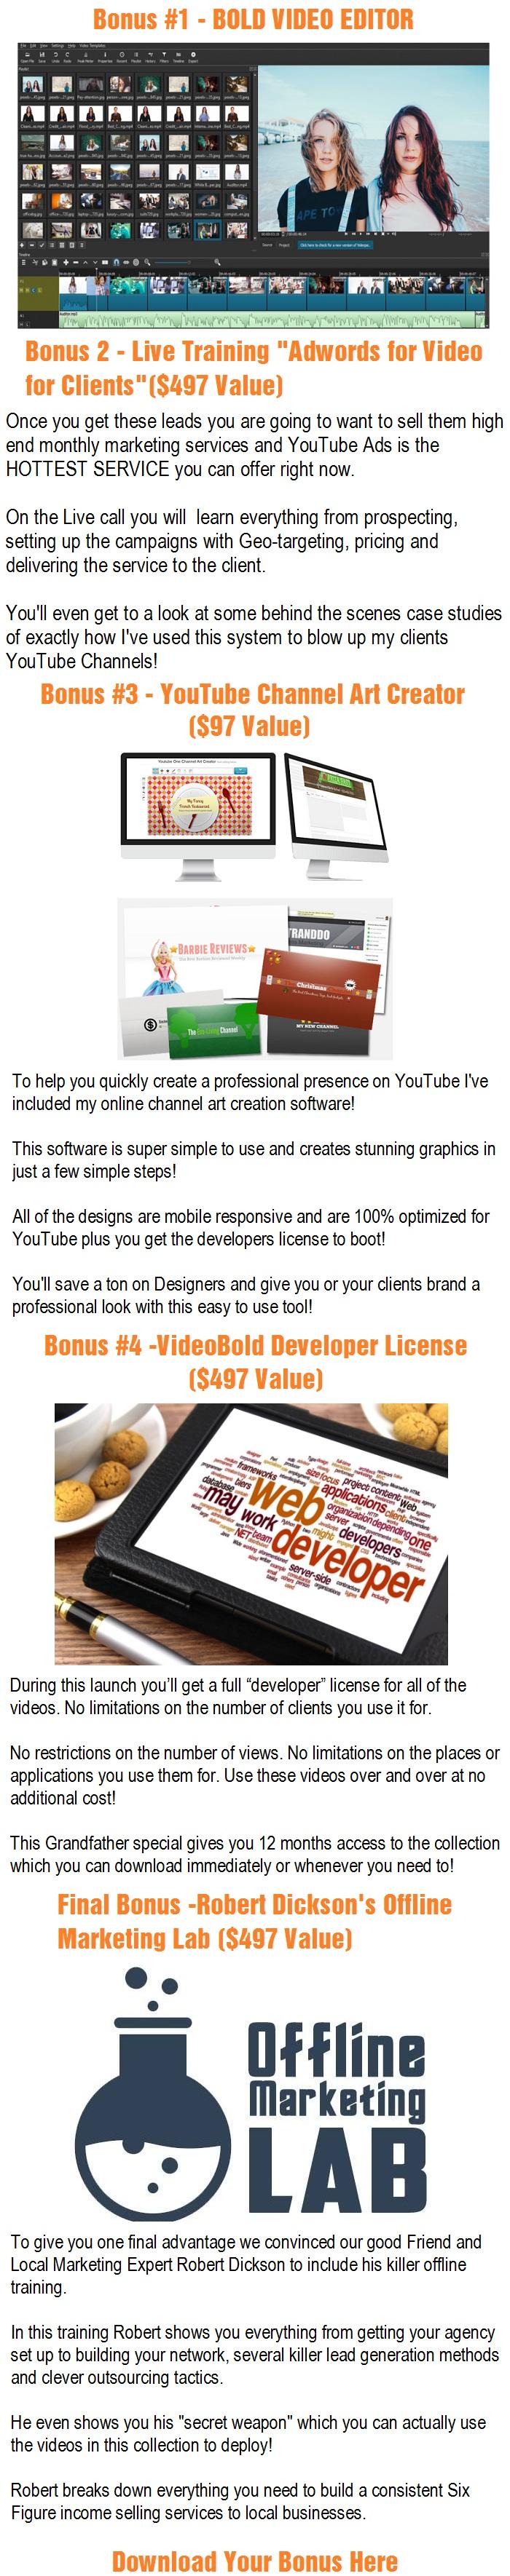 VideoBold 2.0 Bonus